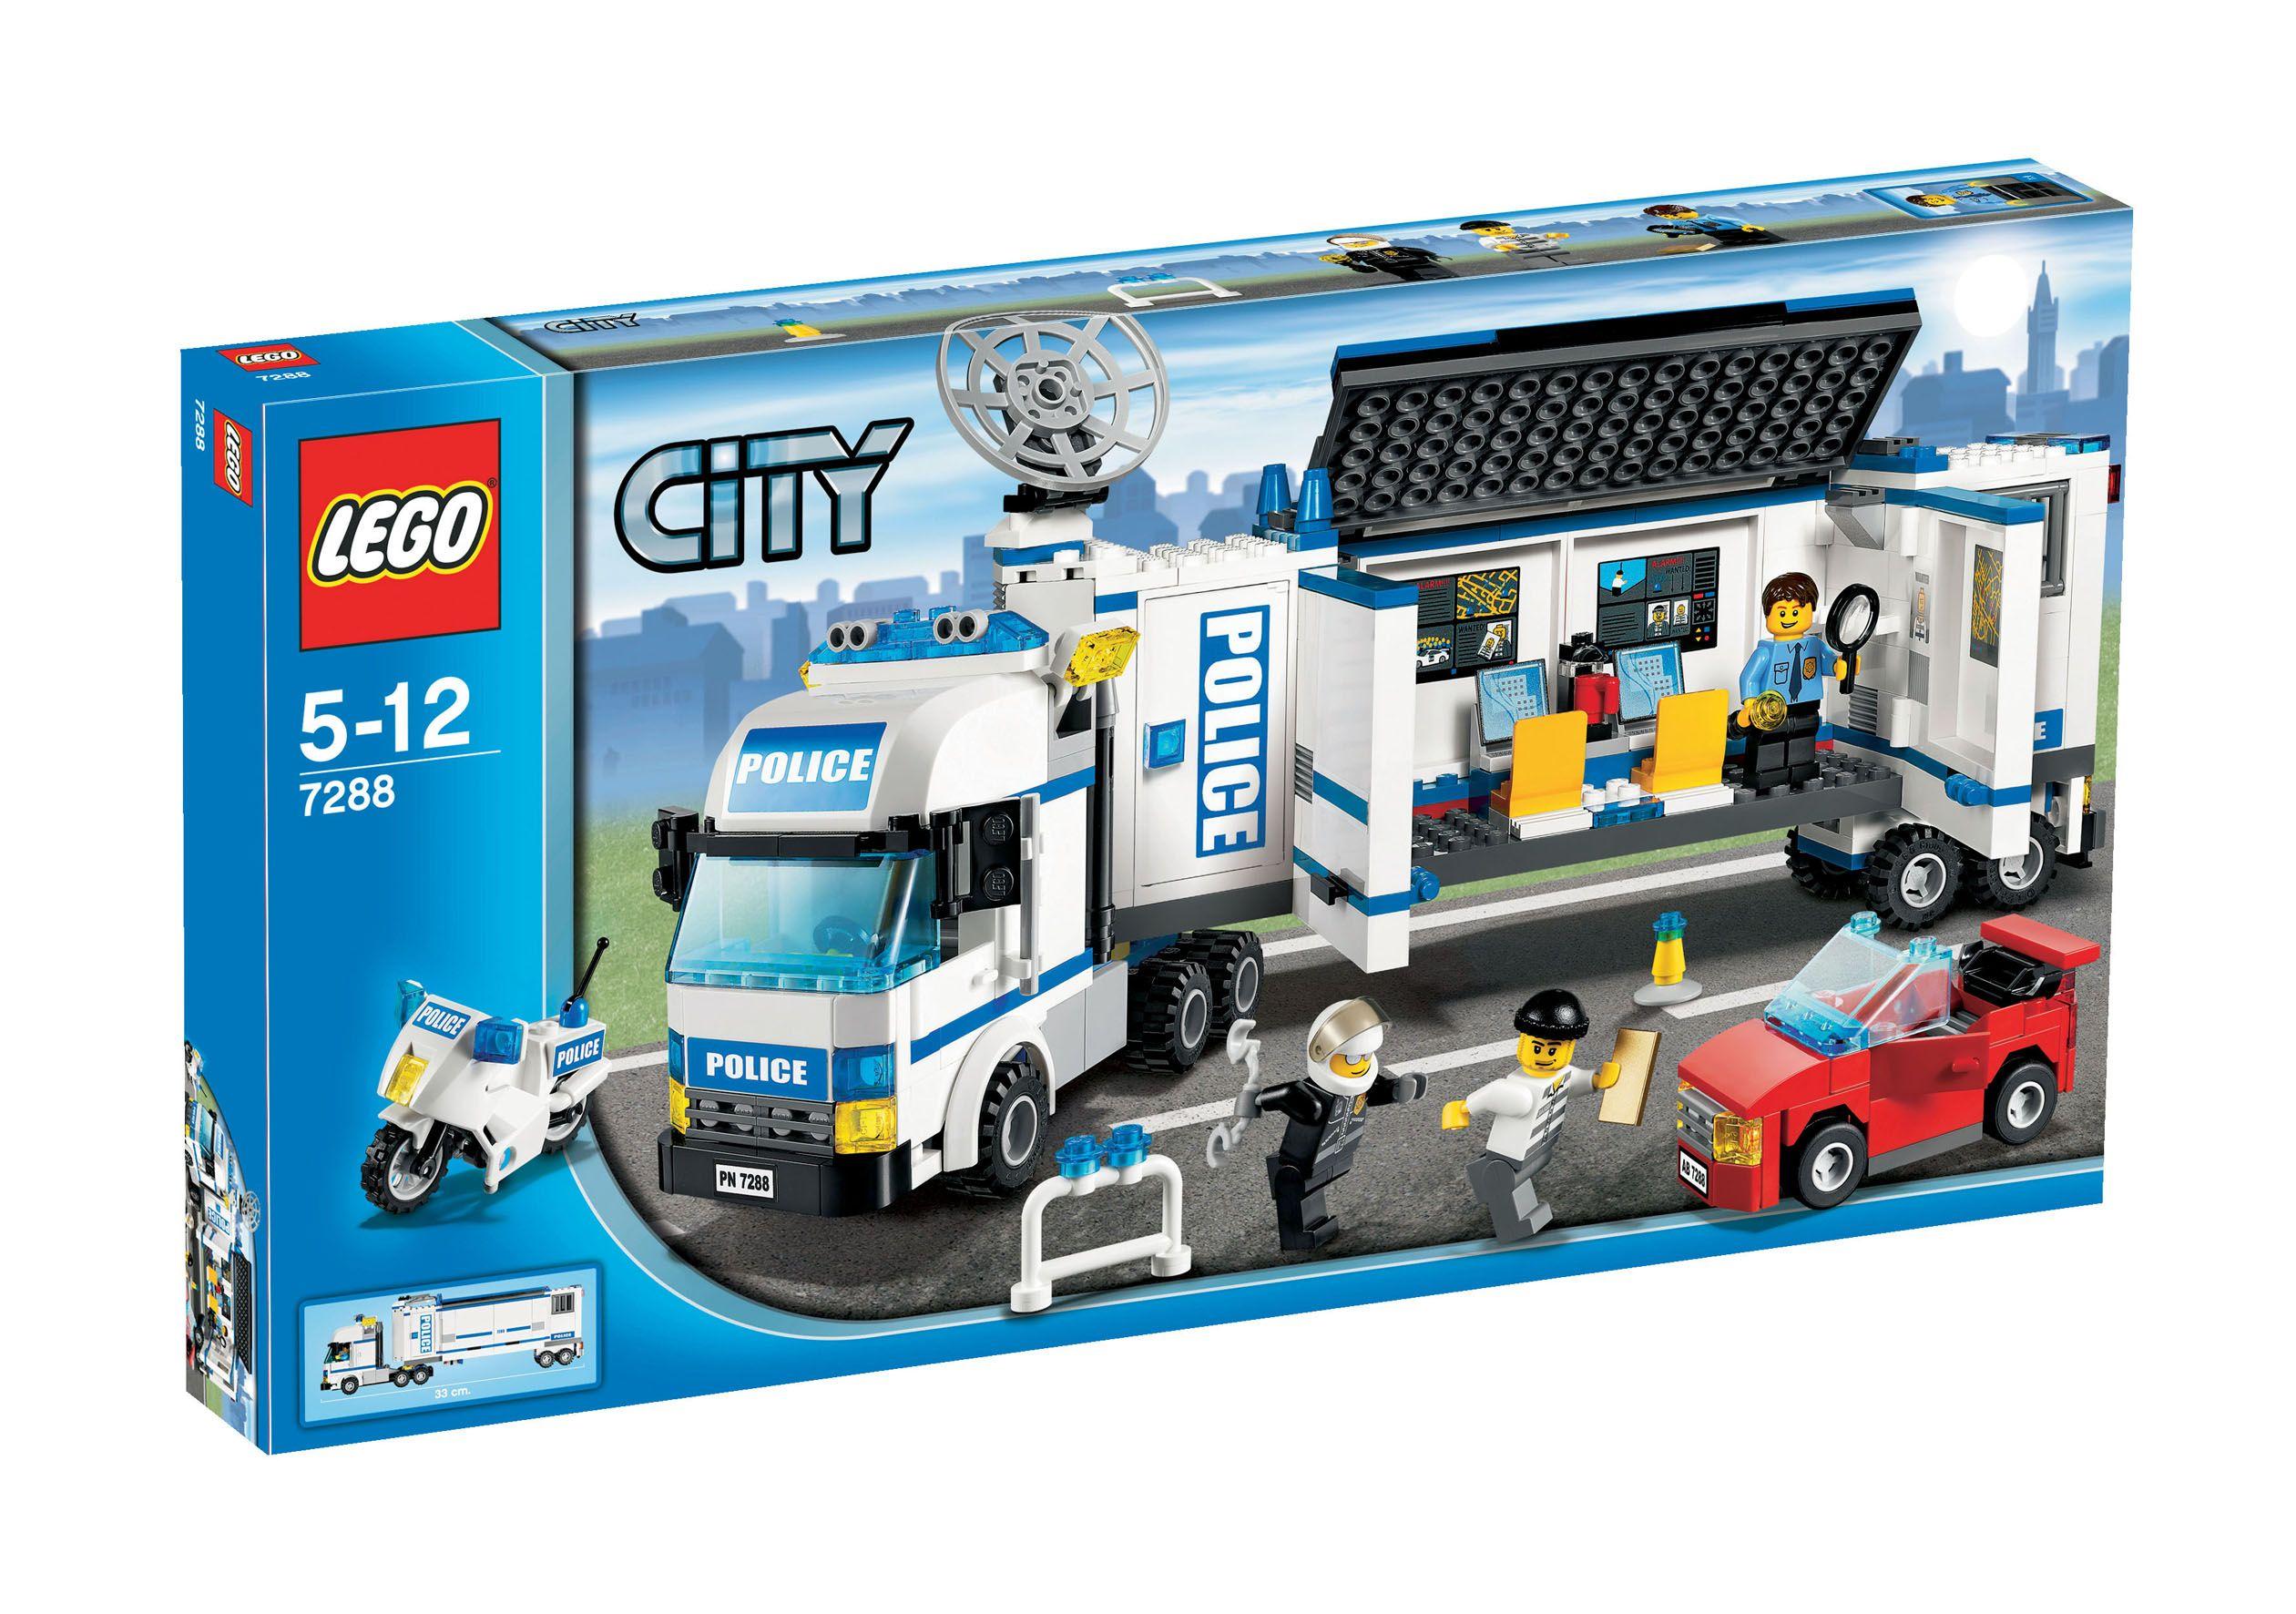 Bricks Indonesia Lego City Police Lego City Sets Lego City Police Station